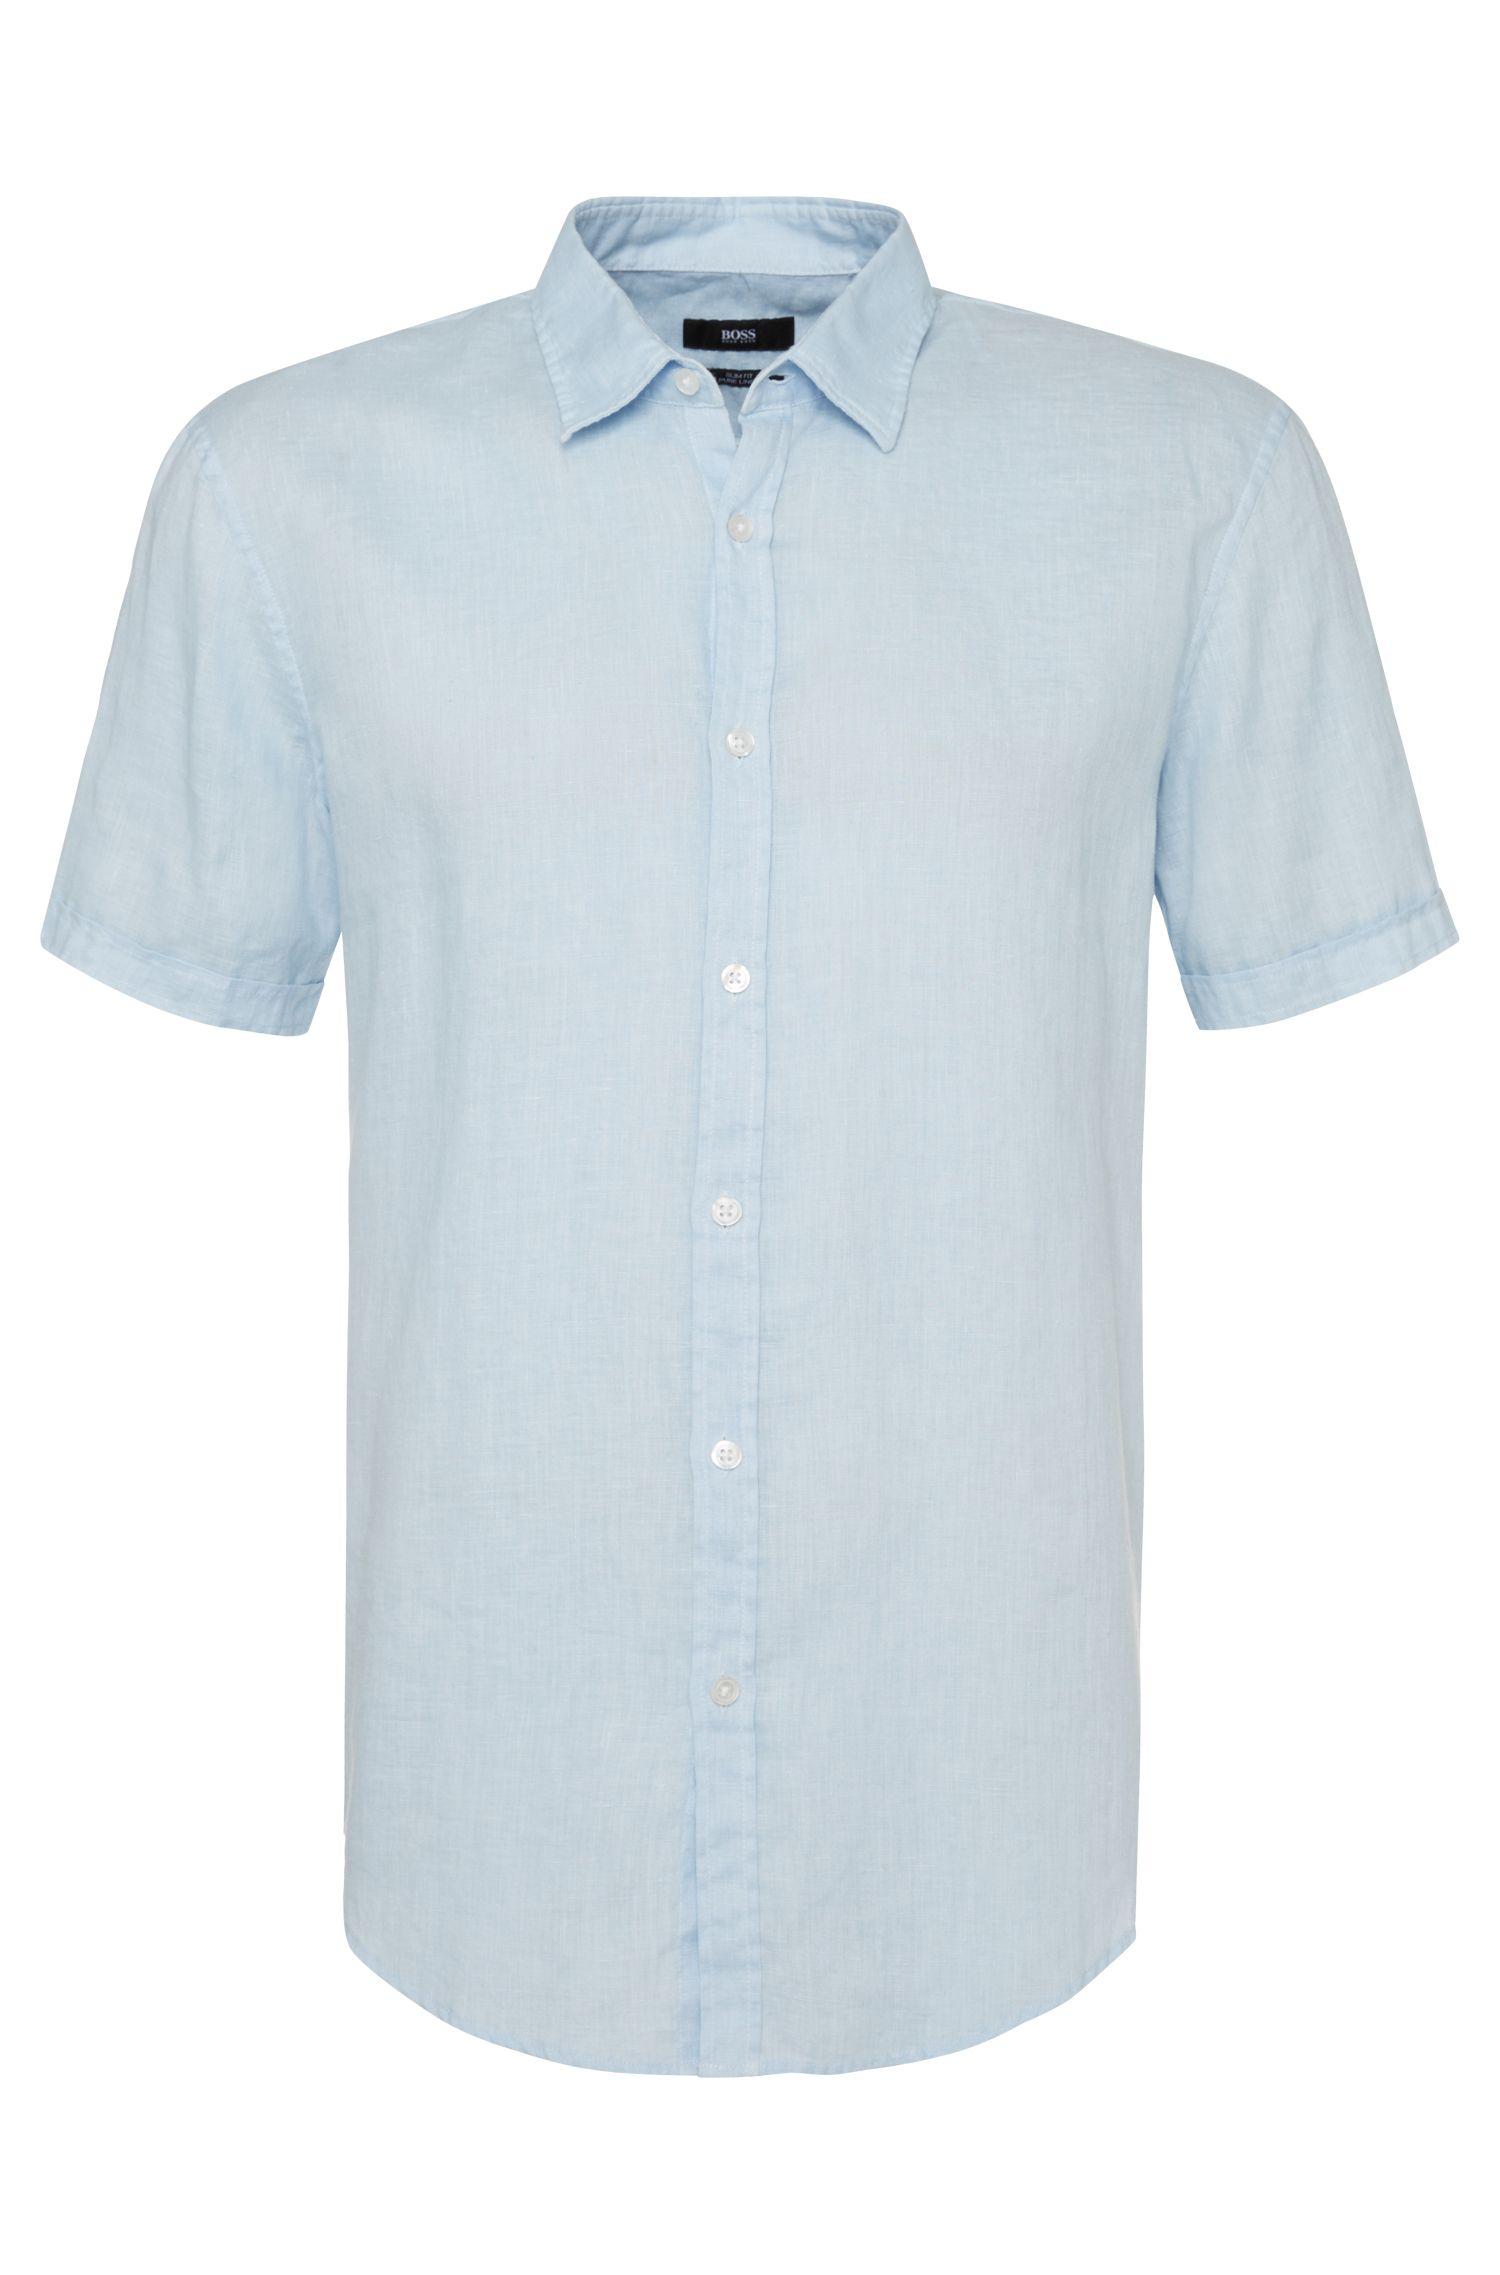 'Ronn' | Slim Fit, Linen Button Down Shirt